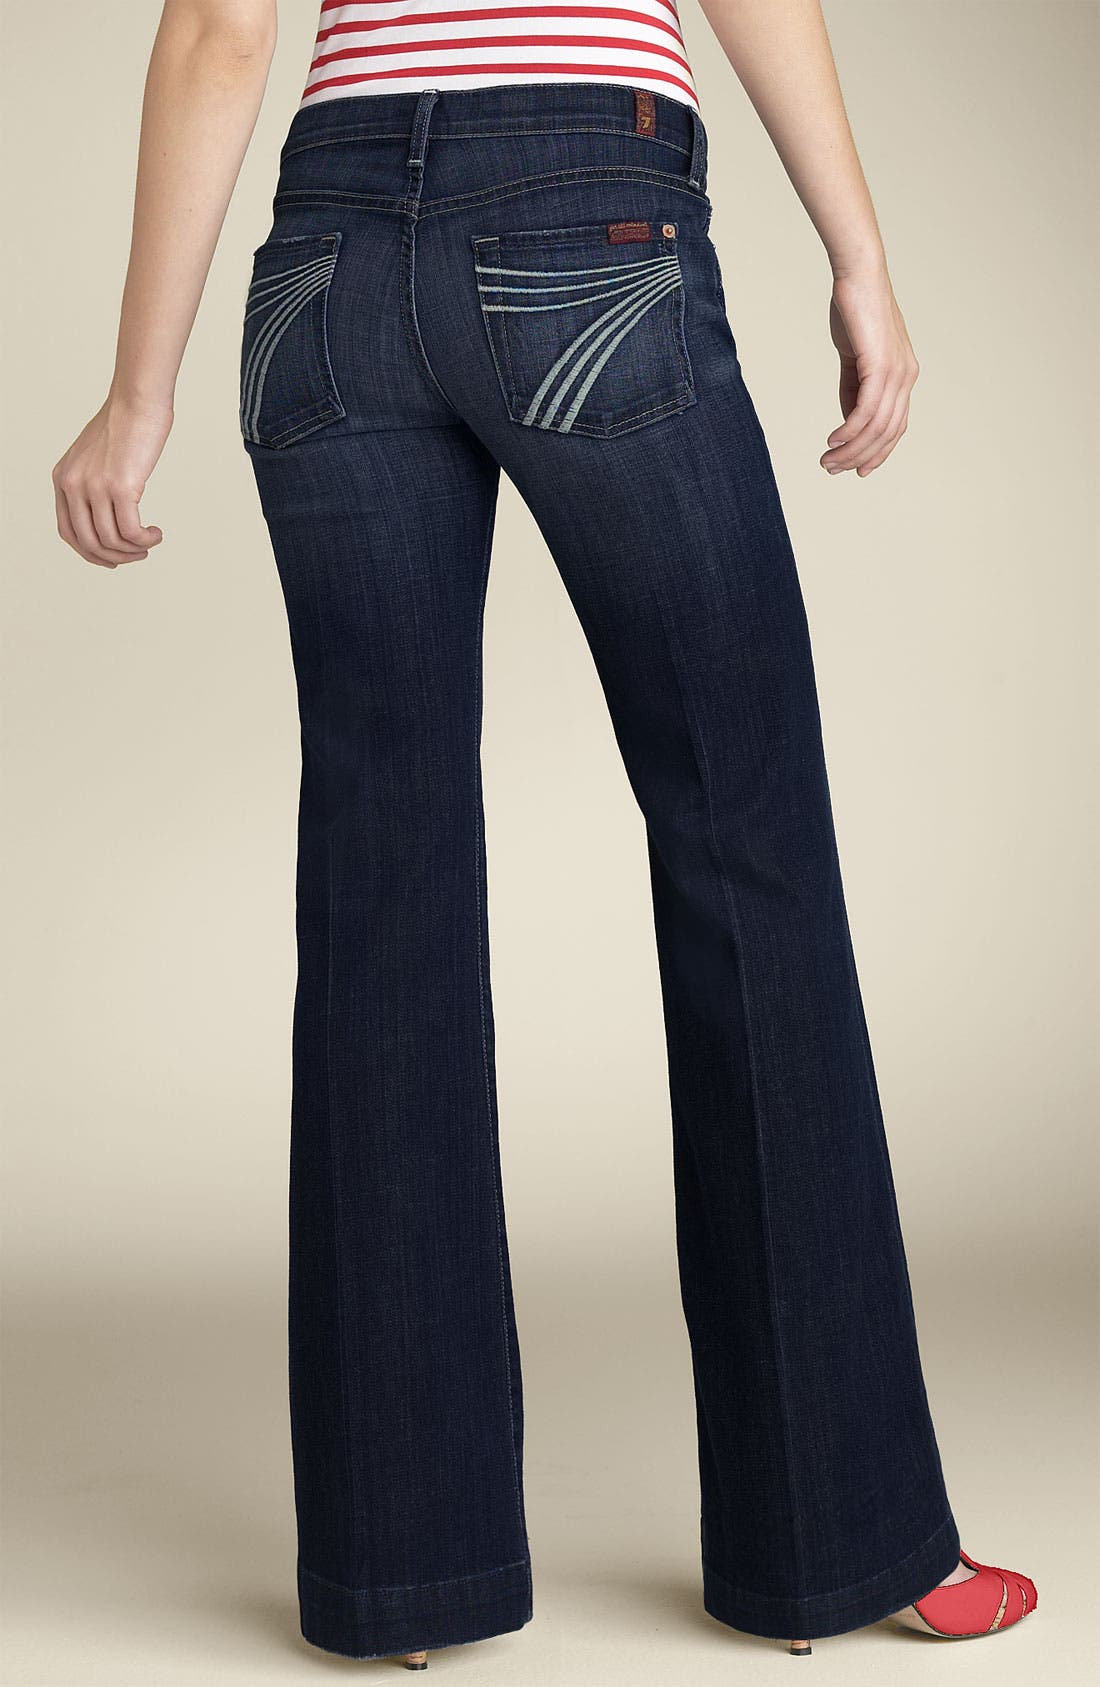 'Dojo' Stretch Trouser Jeans,                             Main thumbnail 1, color,                             499